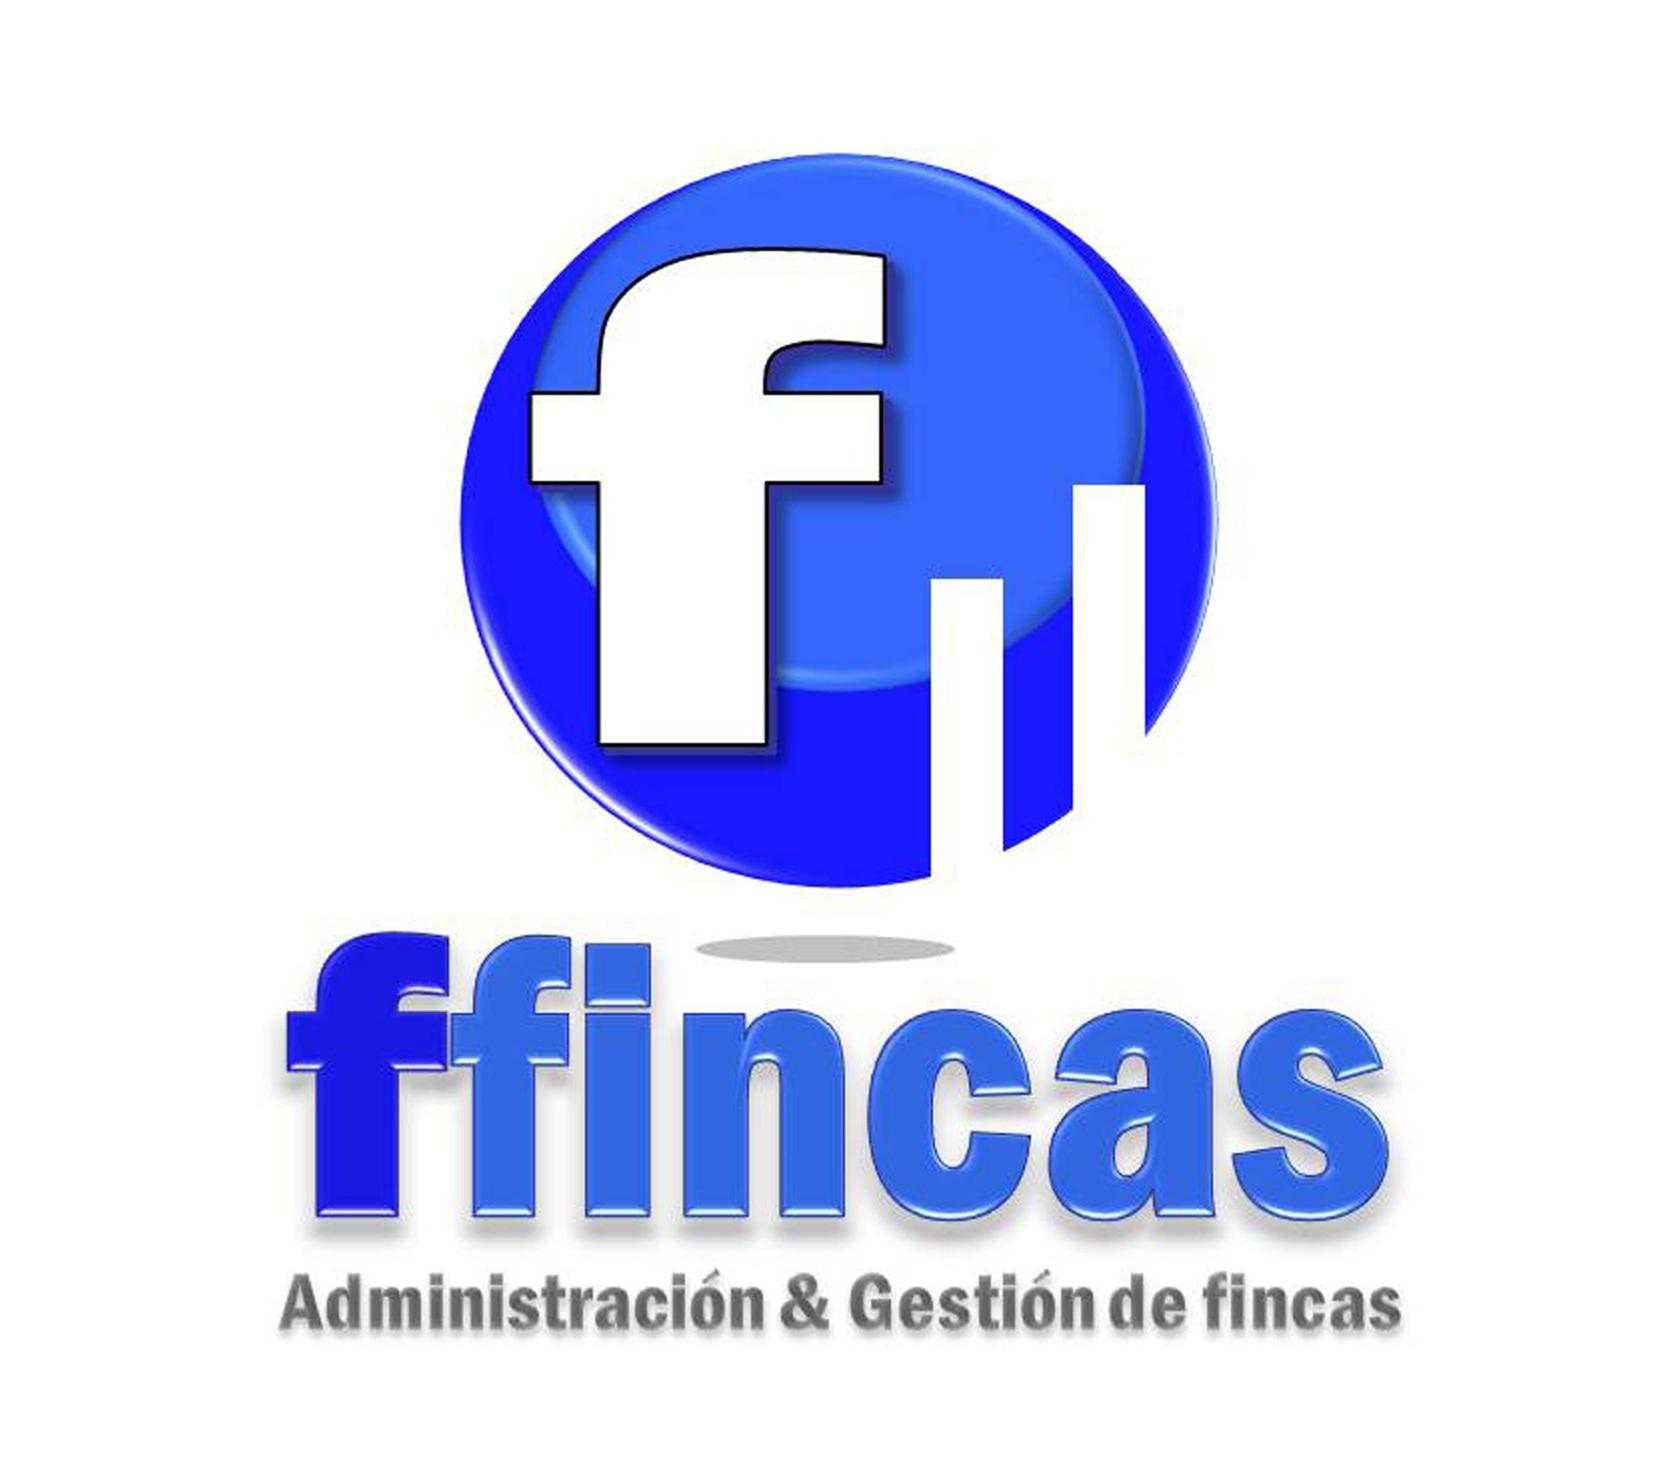 Ffincas sl administraci n gesti n de fincas for Administracion de fincas torrevieja